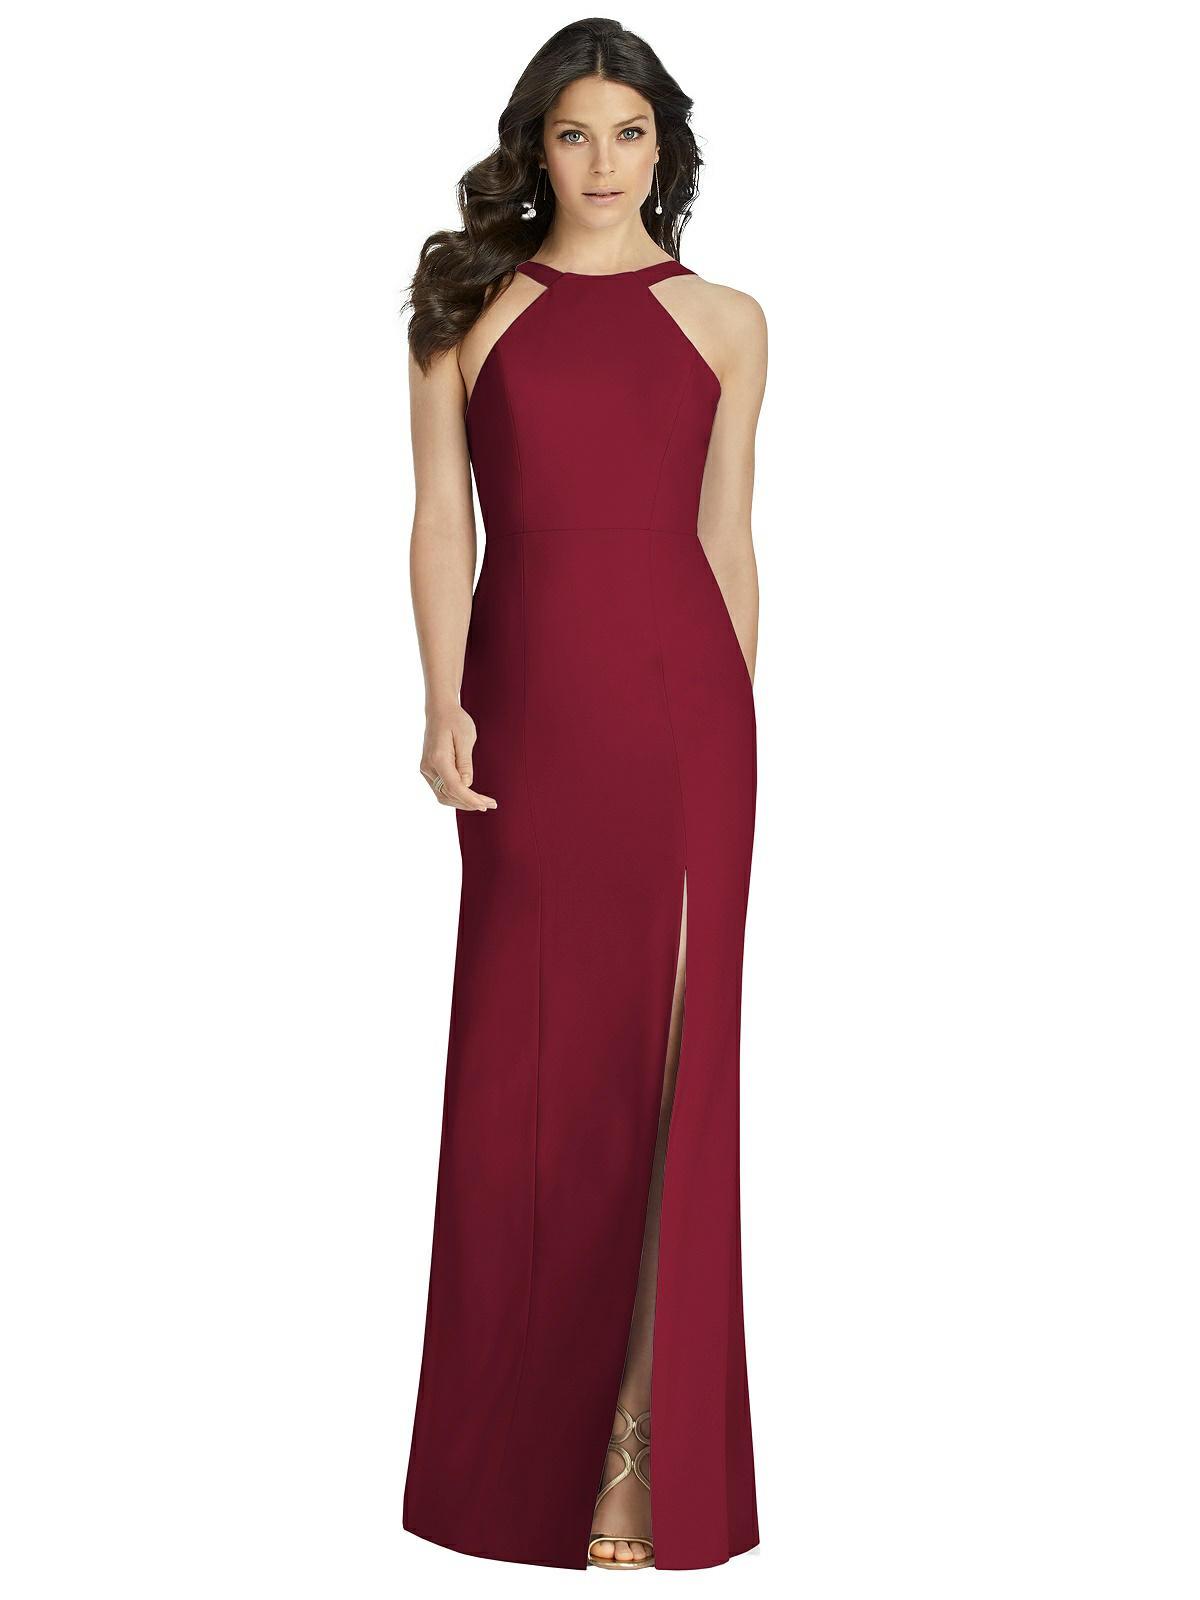 Burgundy Red Bridesmaids Dress